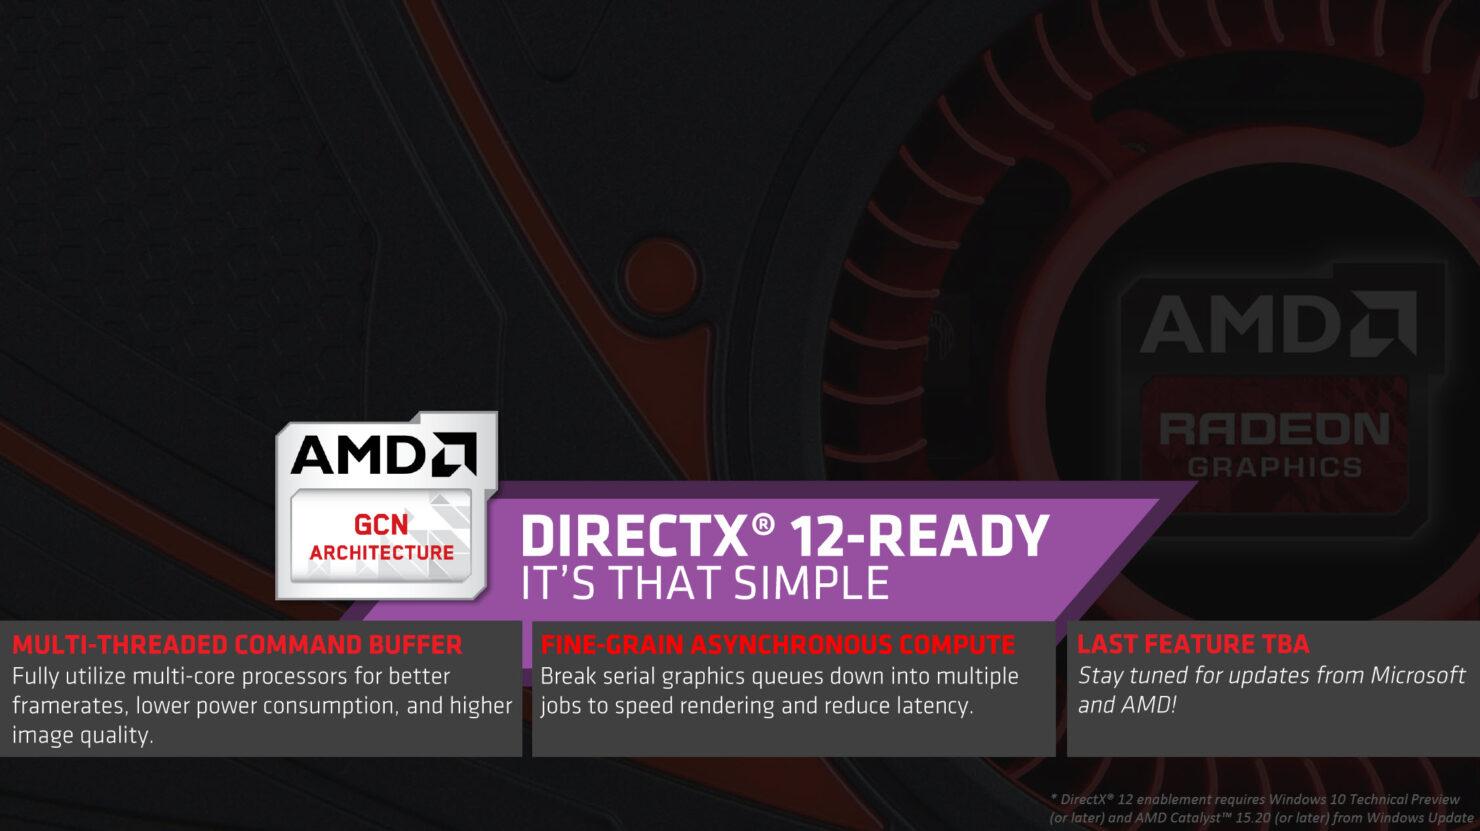 amd-directx-12-ready